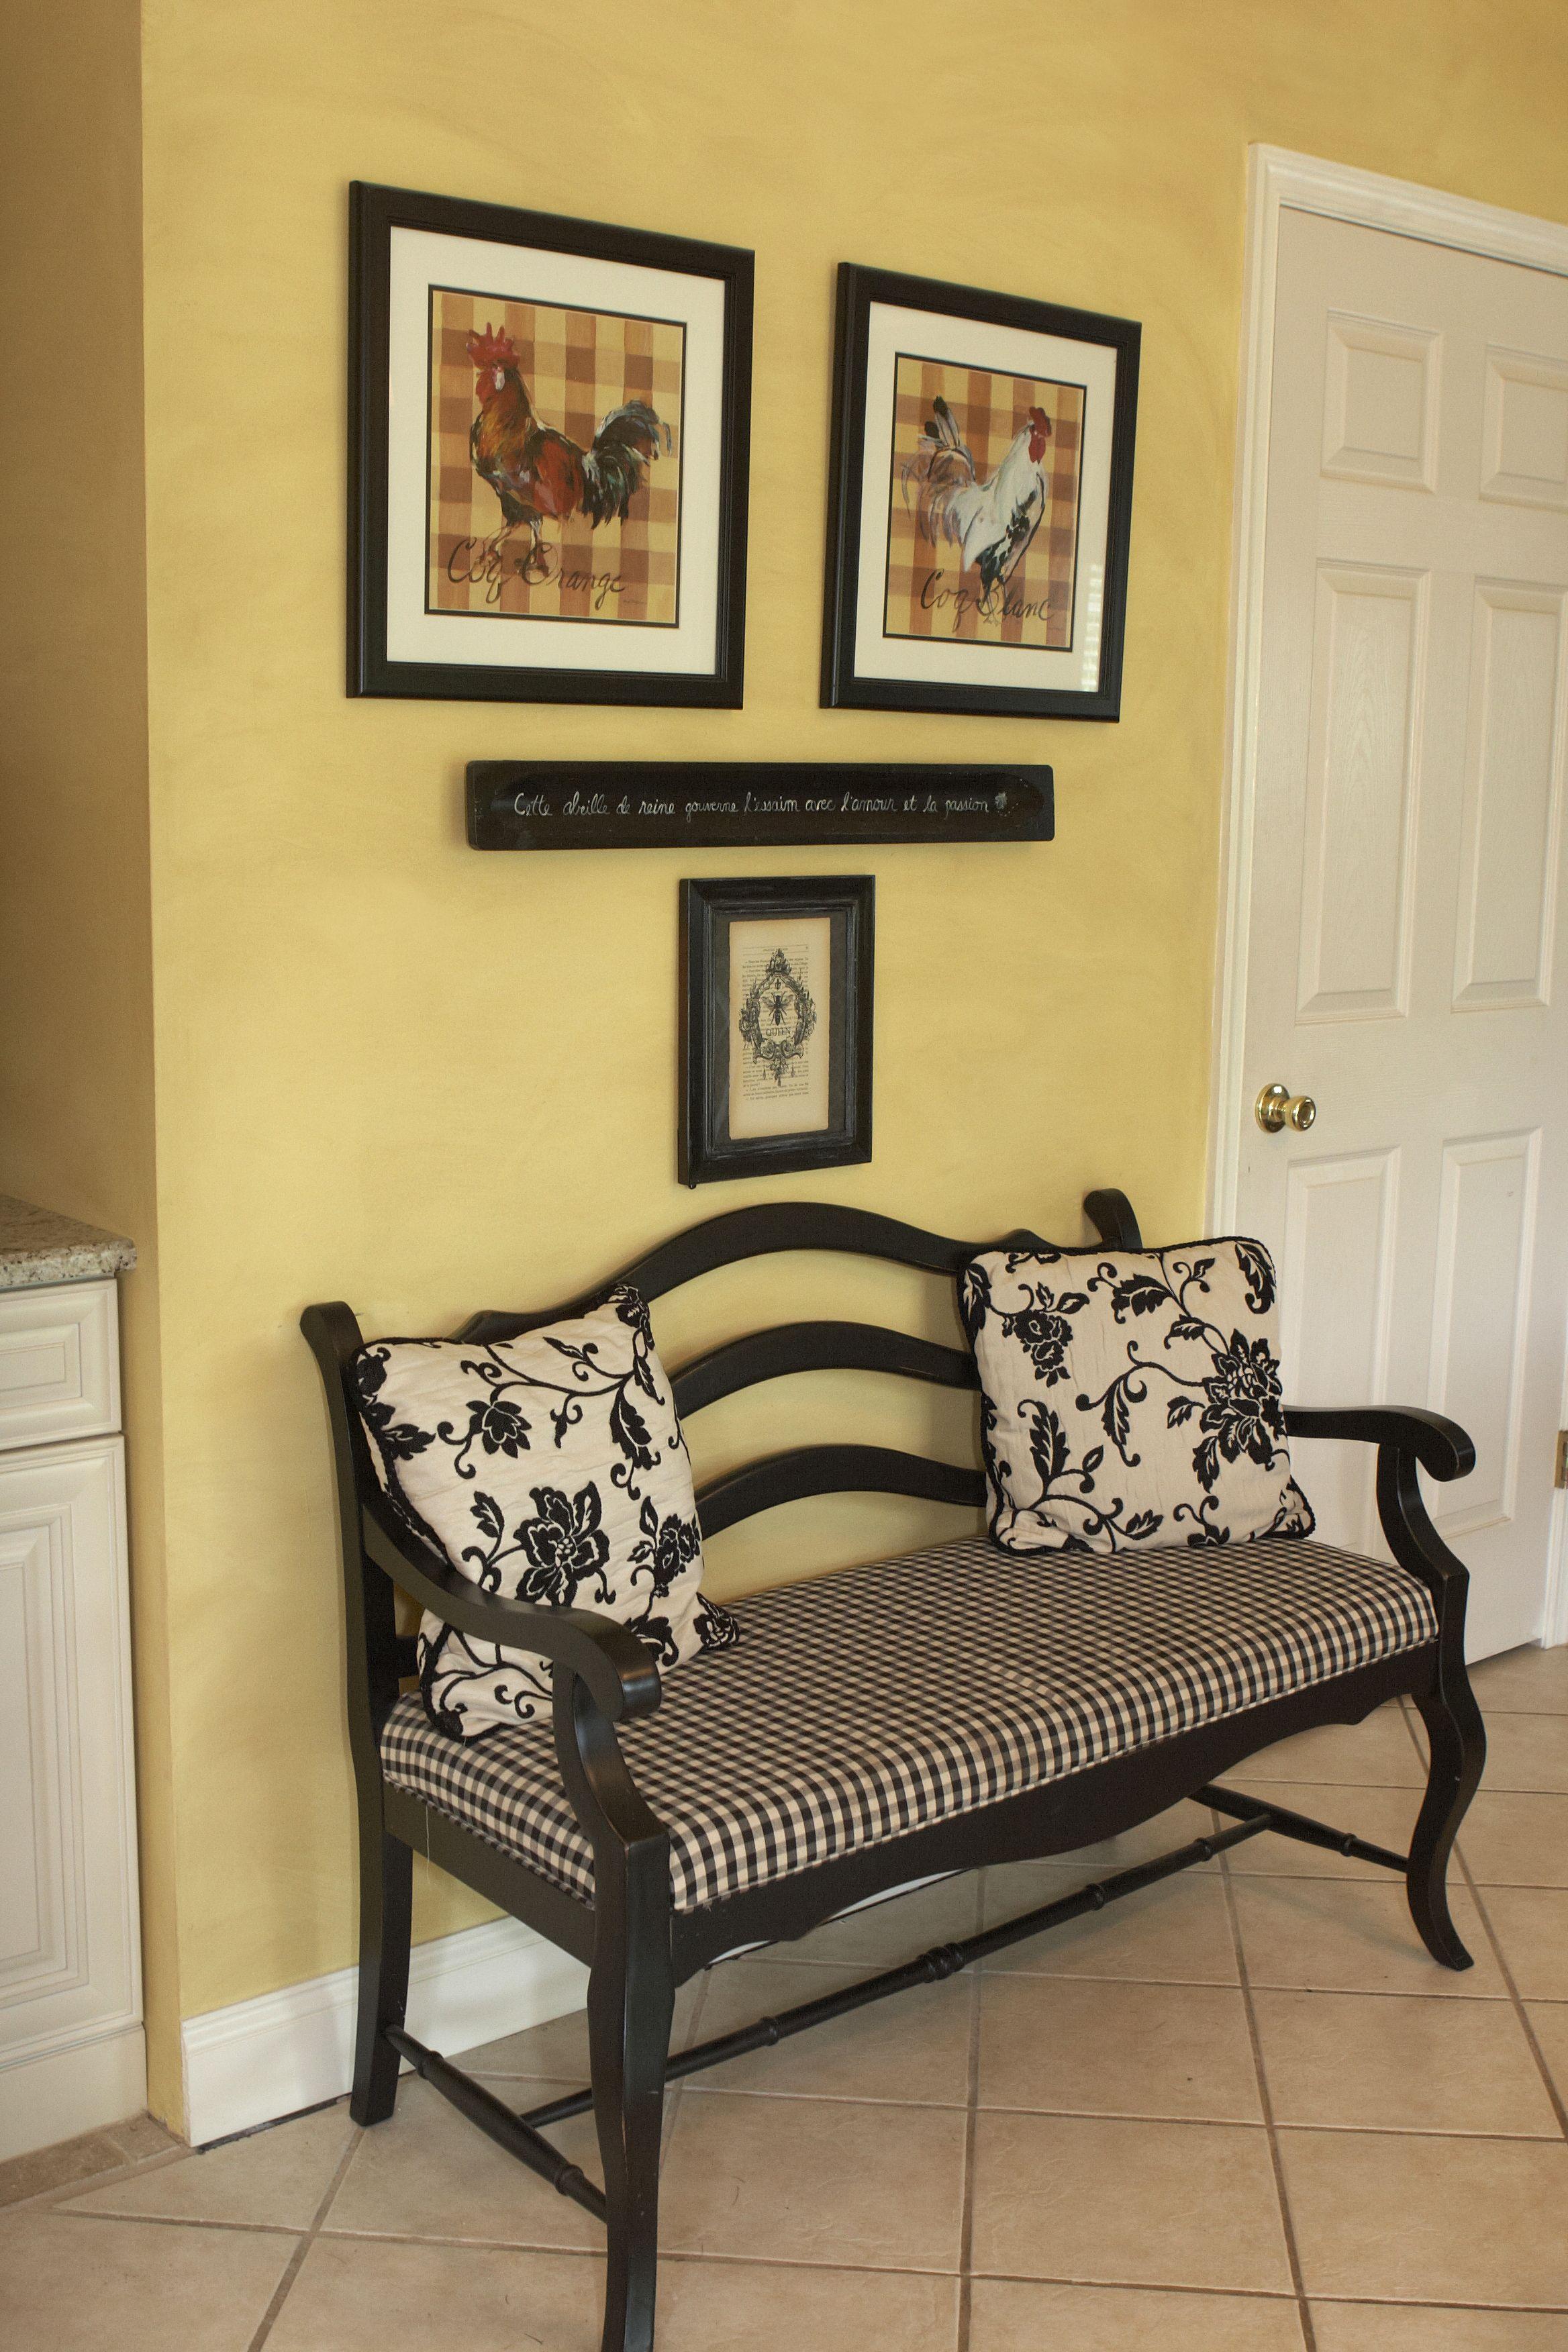 Amazing Home Goods Frames Festooning - Framed Art Ideas ...